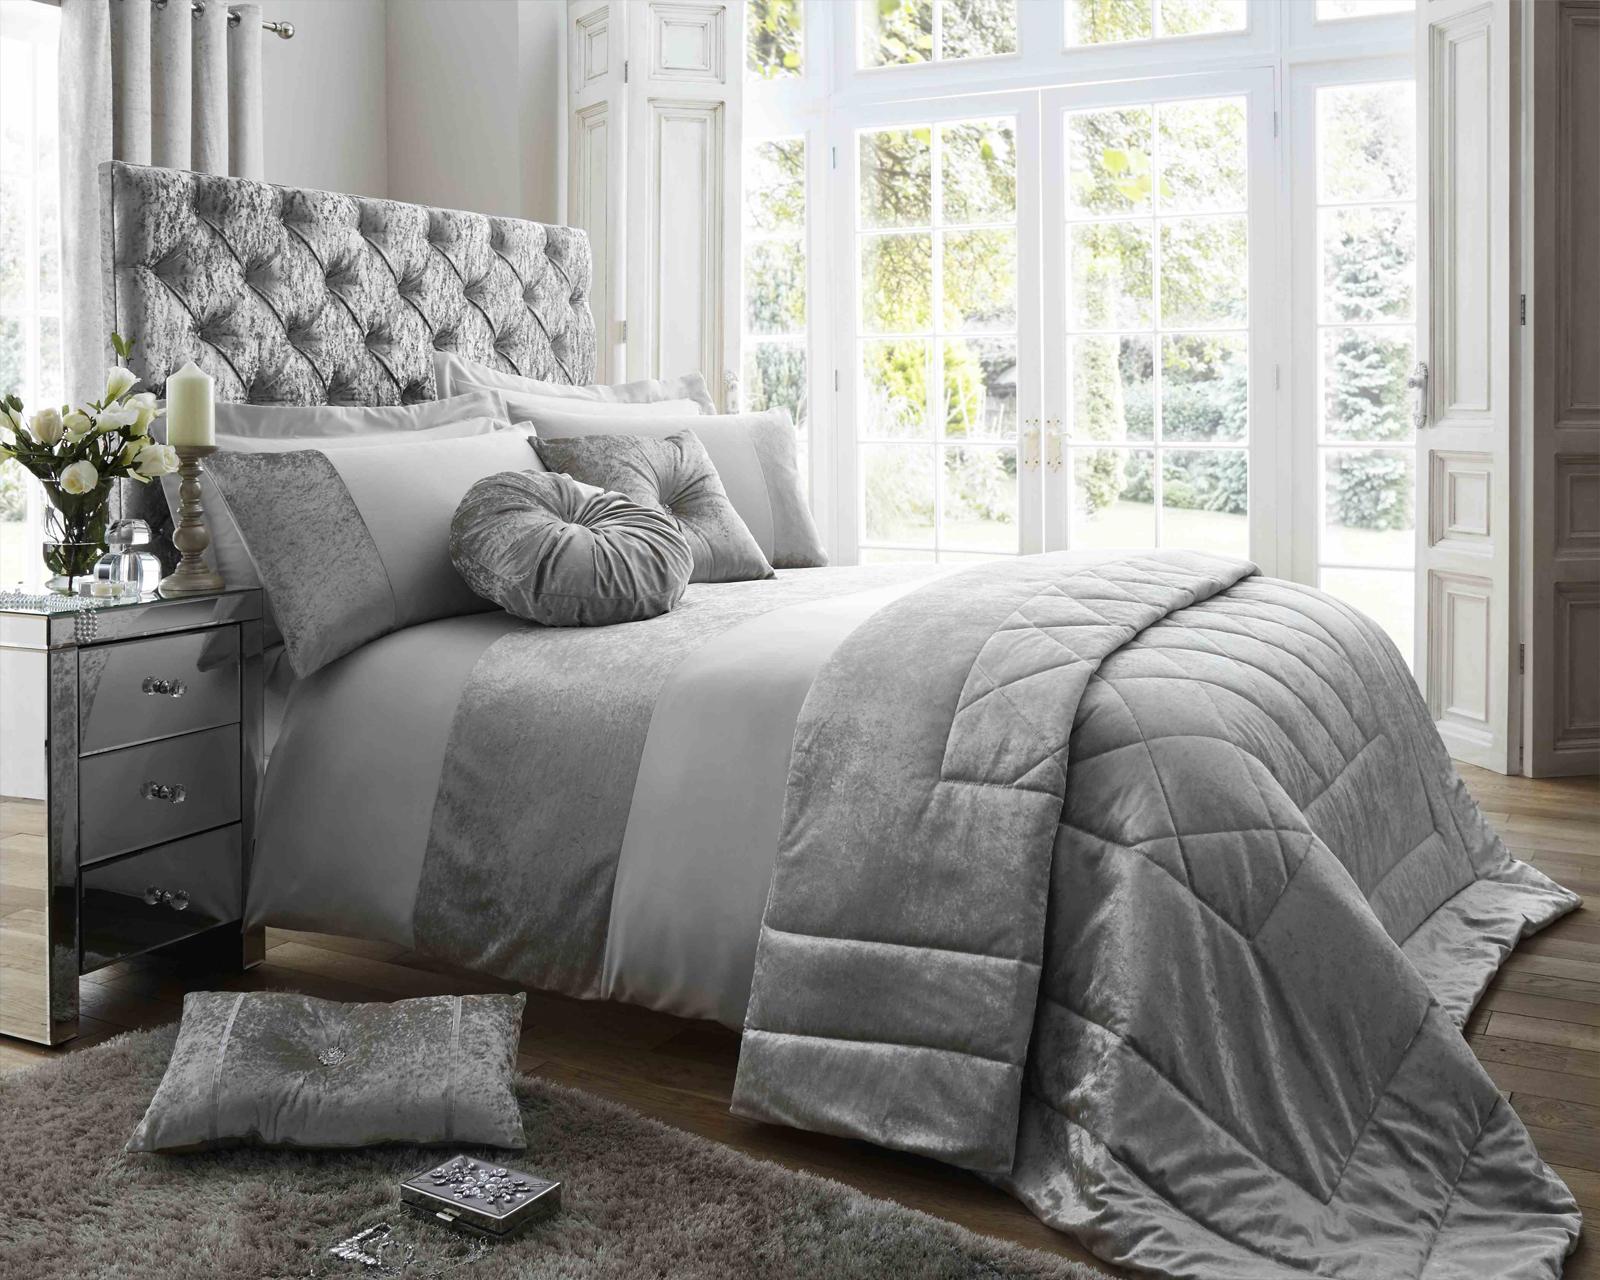 Duchess Silver Luxury Bedding Range With Crushed Velvet